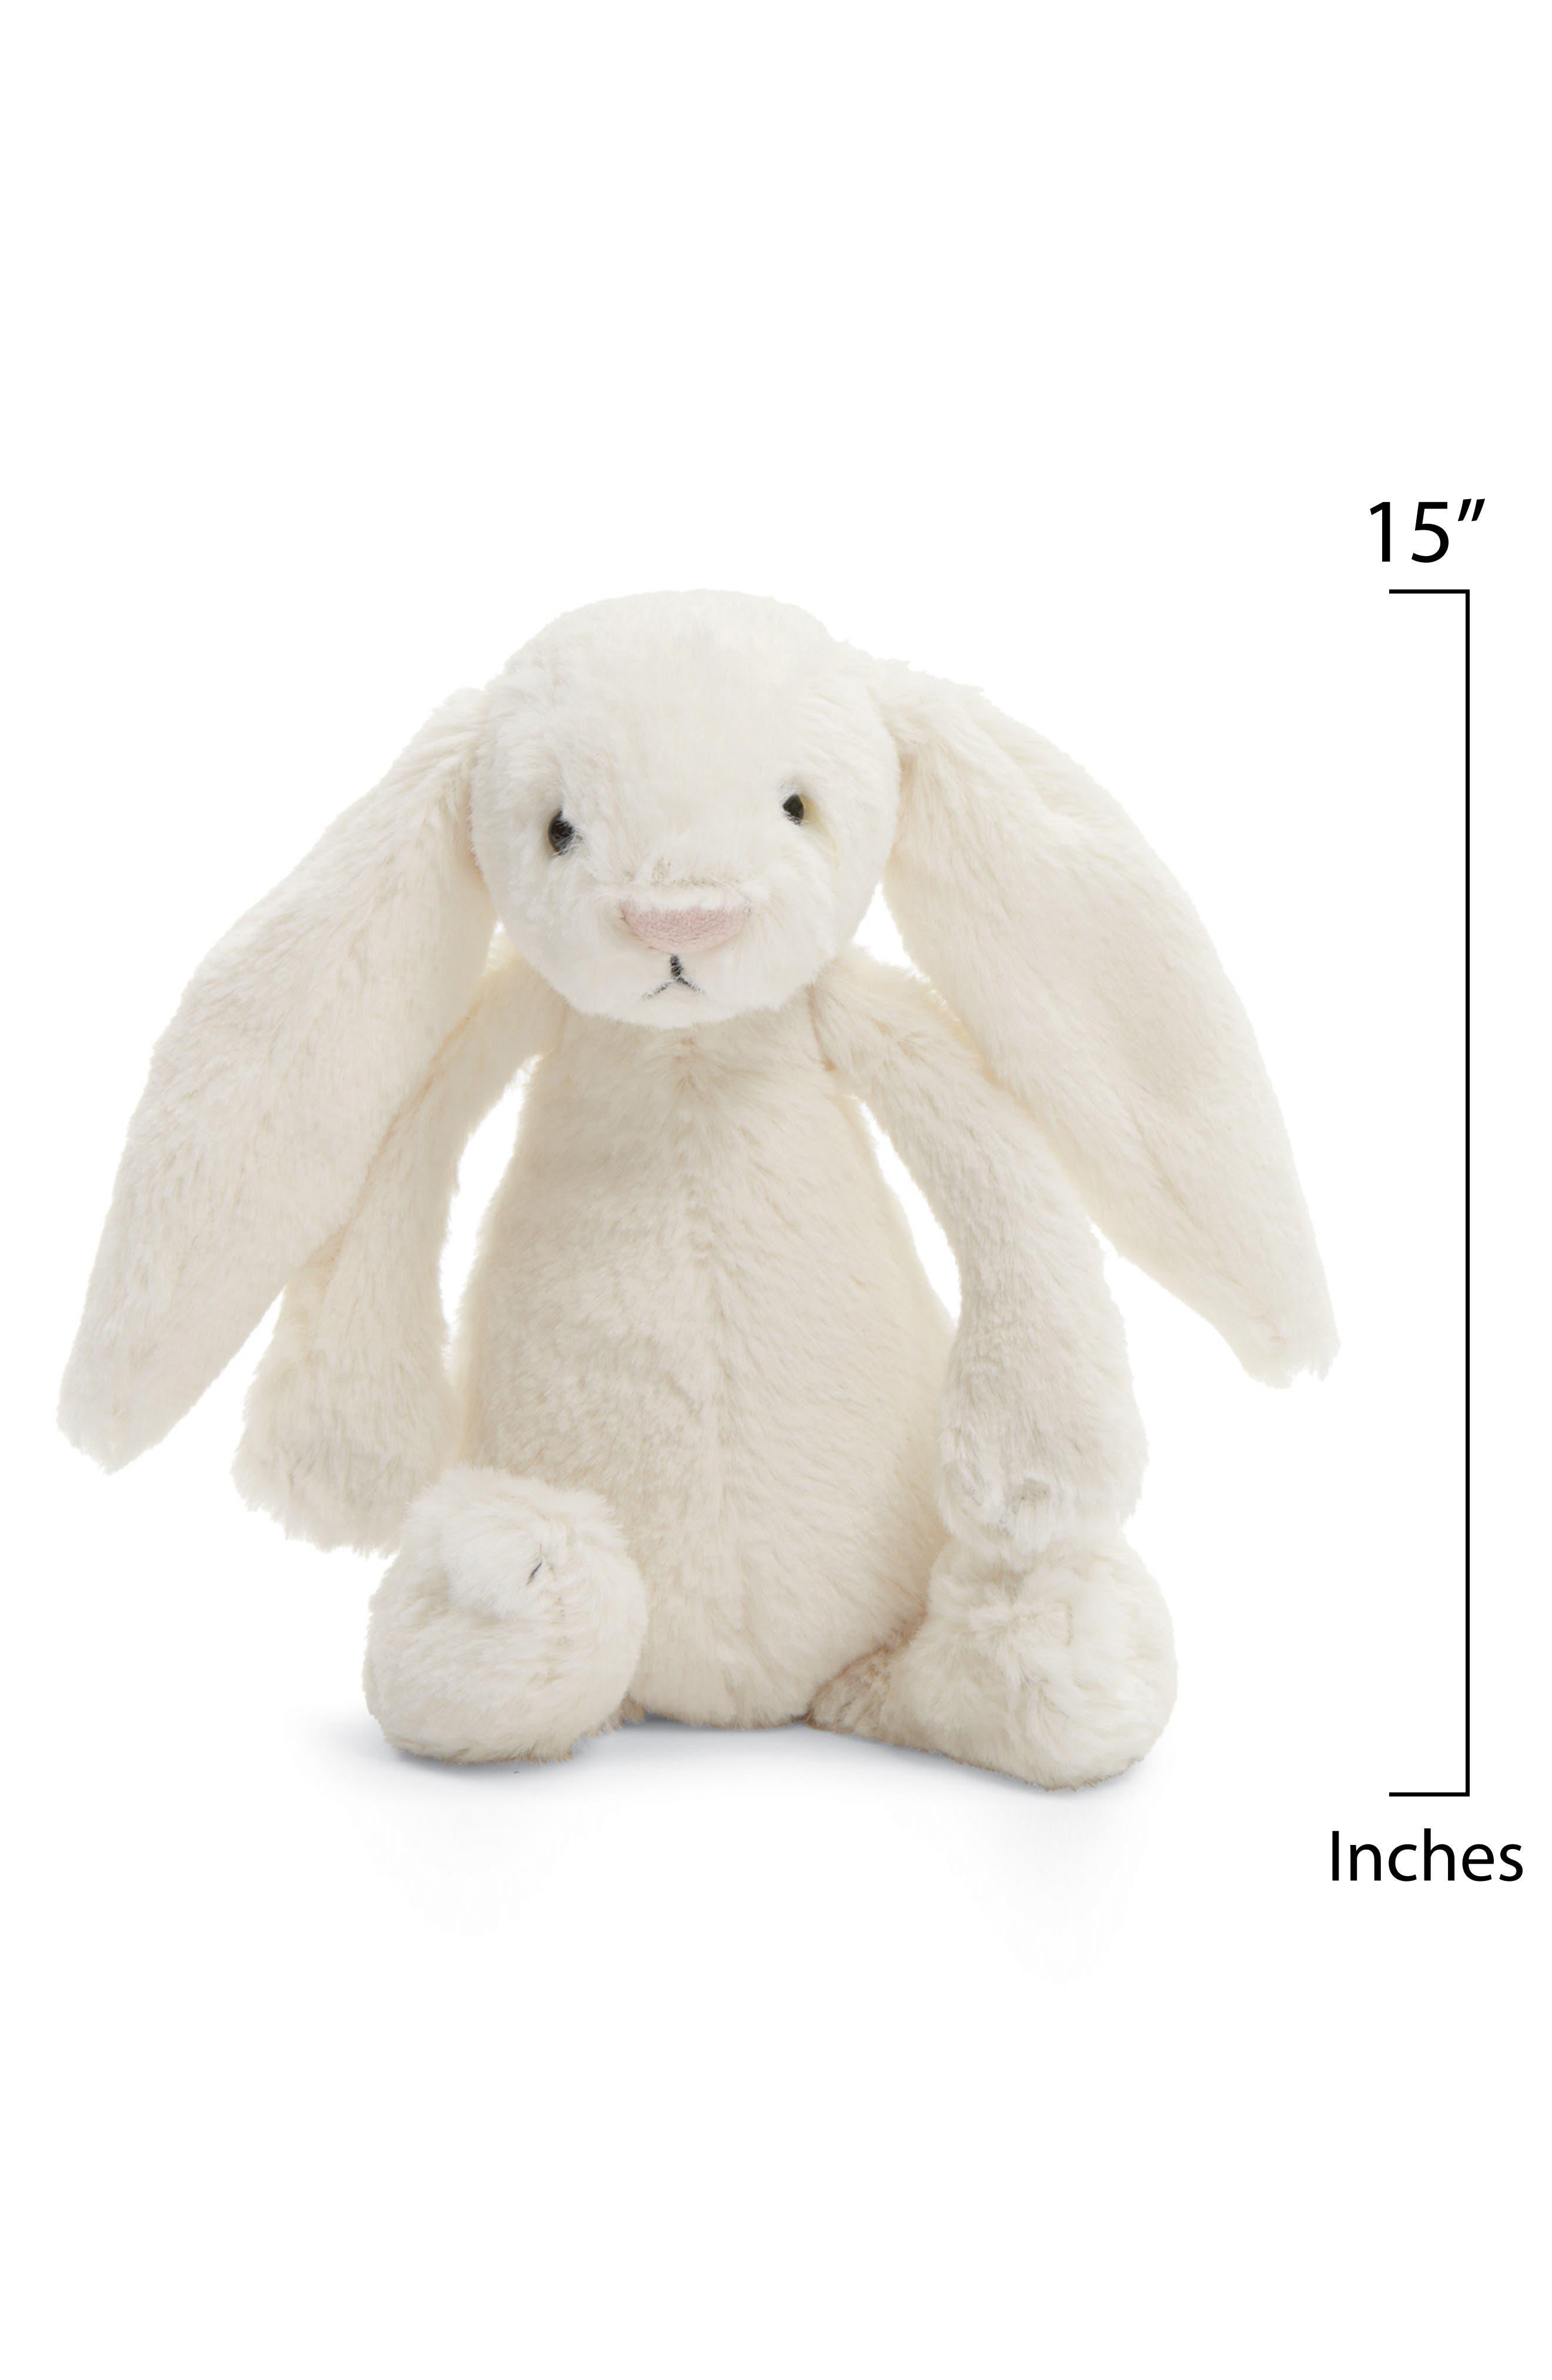 'Large Bashful Bunny' Stuffed Animal,                             Alternate thumbnail 2, color,                             CREAM